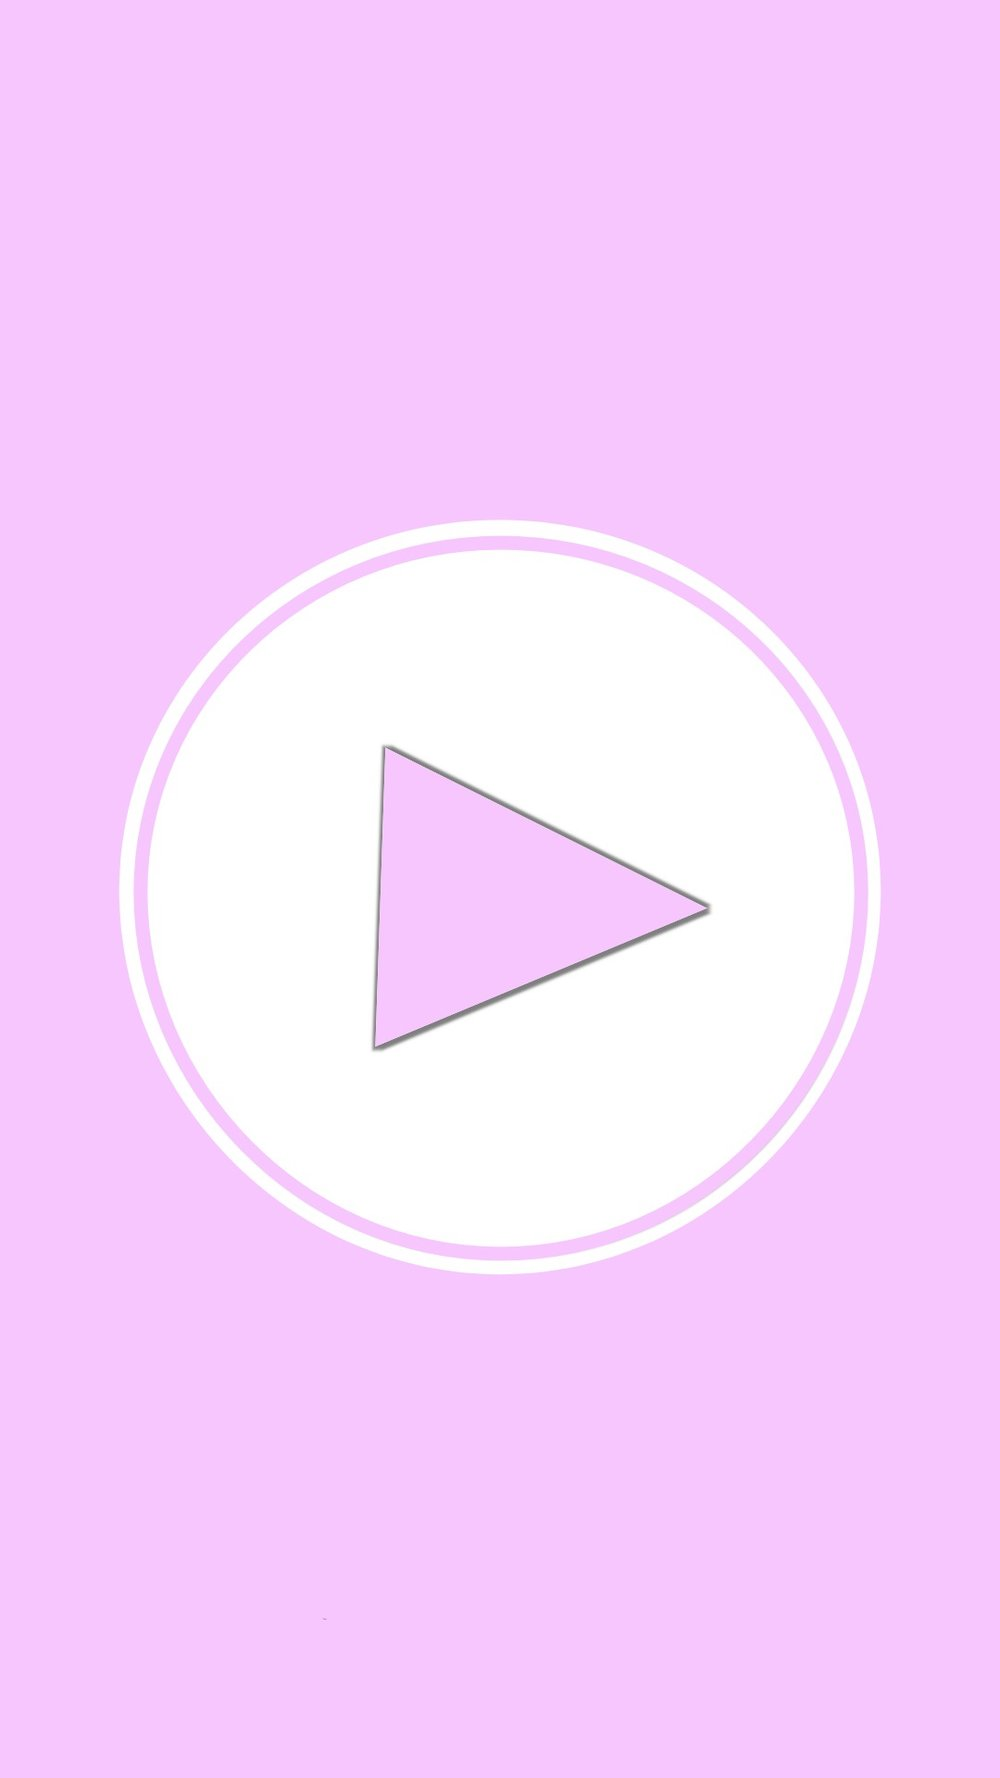 Instagram-cover-play-pink-lotnotes.com.jpg